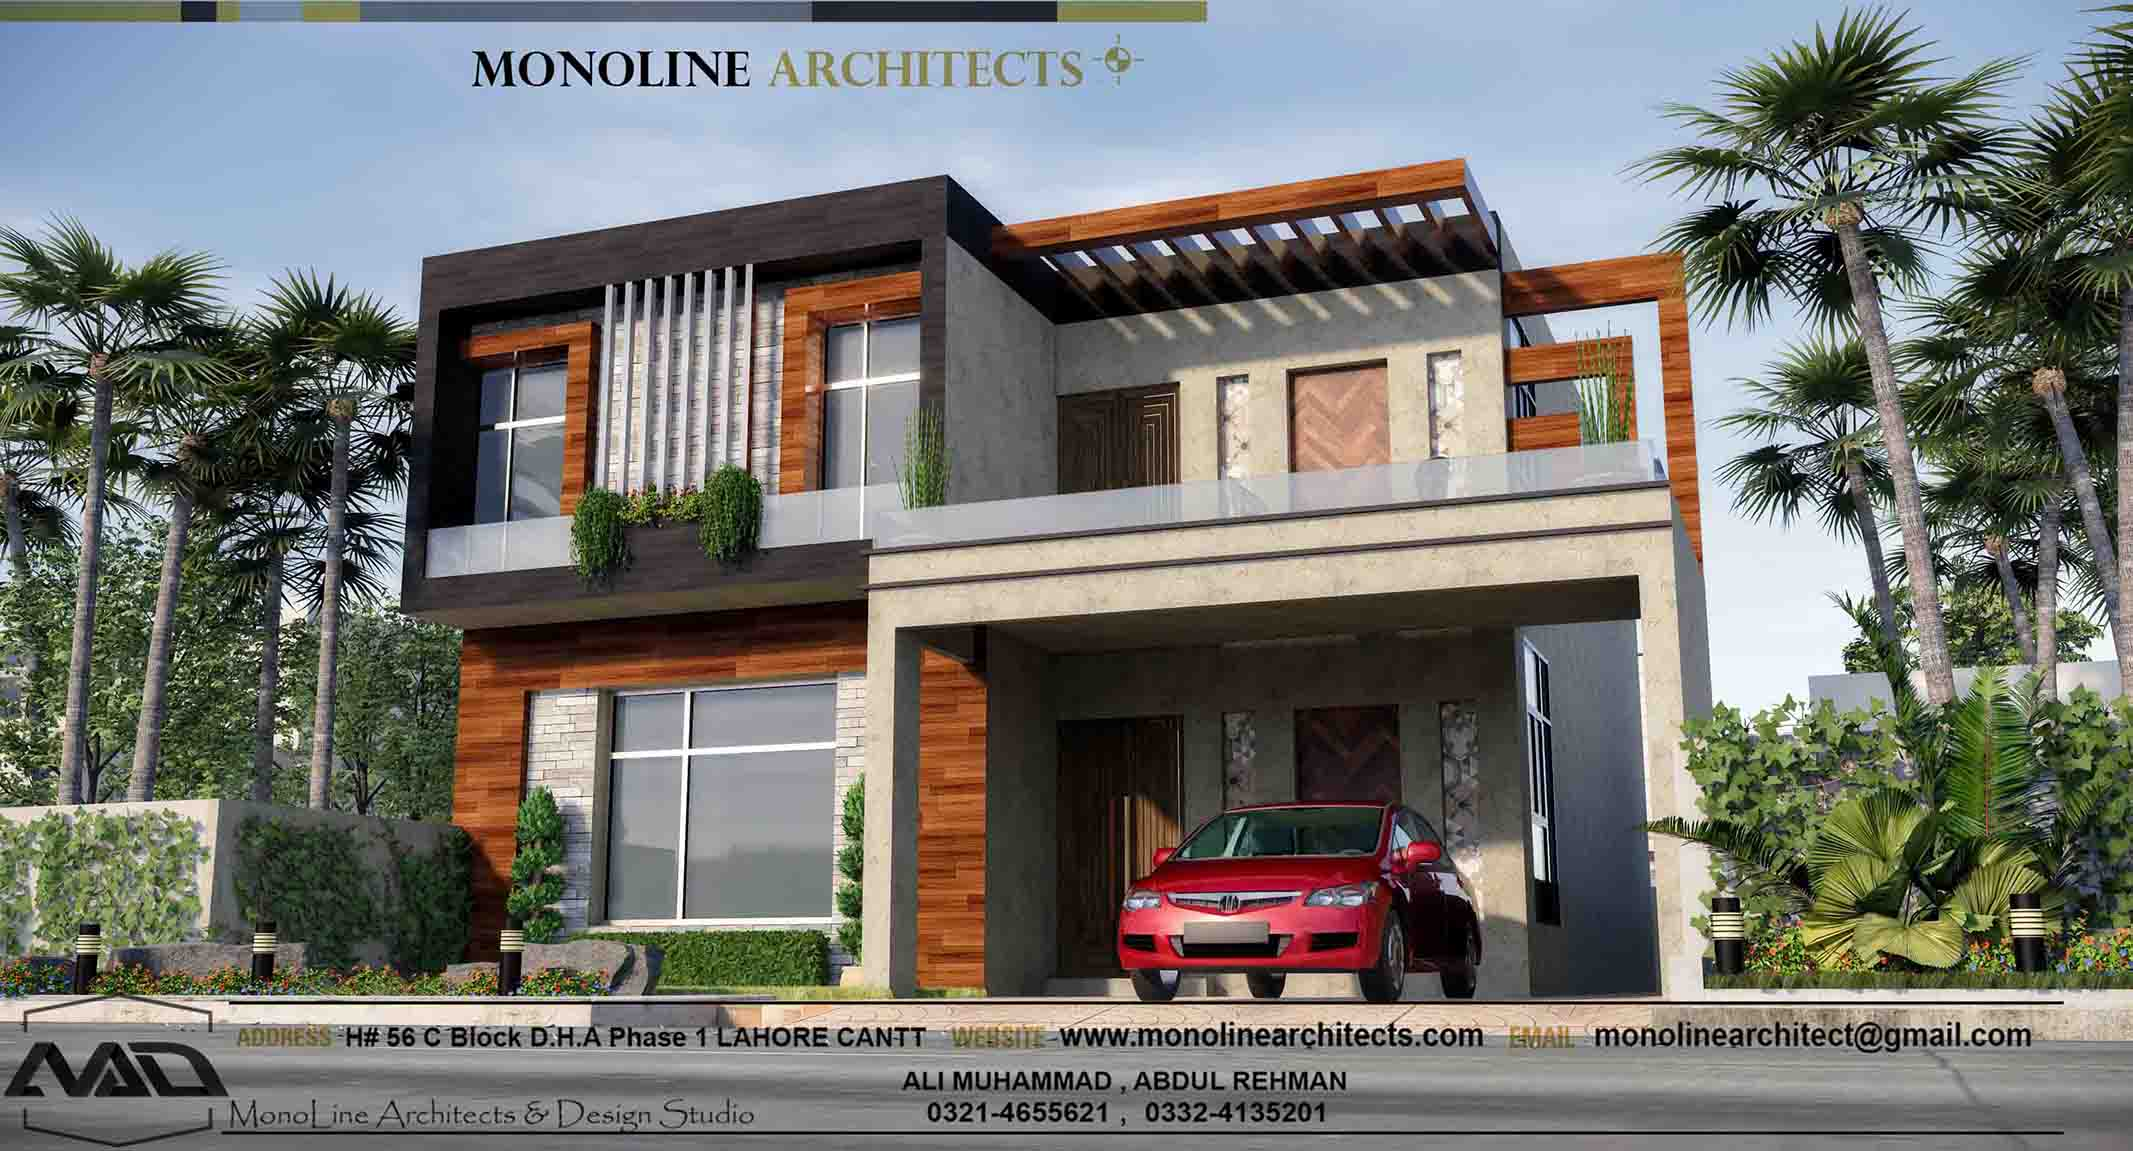 HOUSE RENOVATION 2